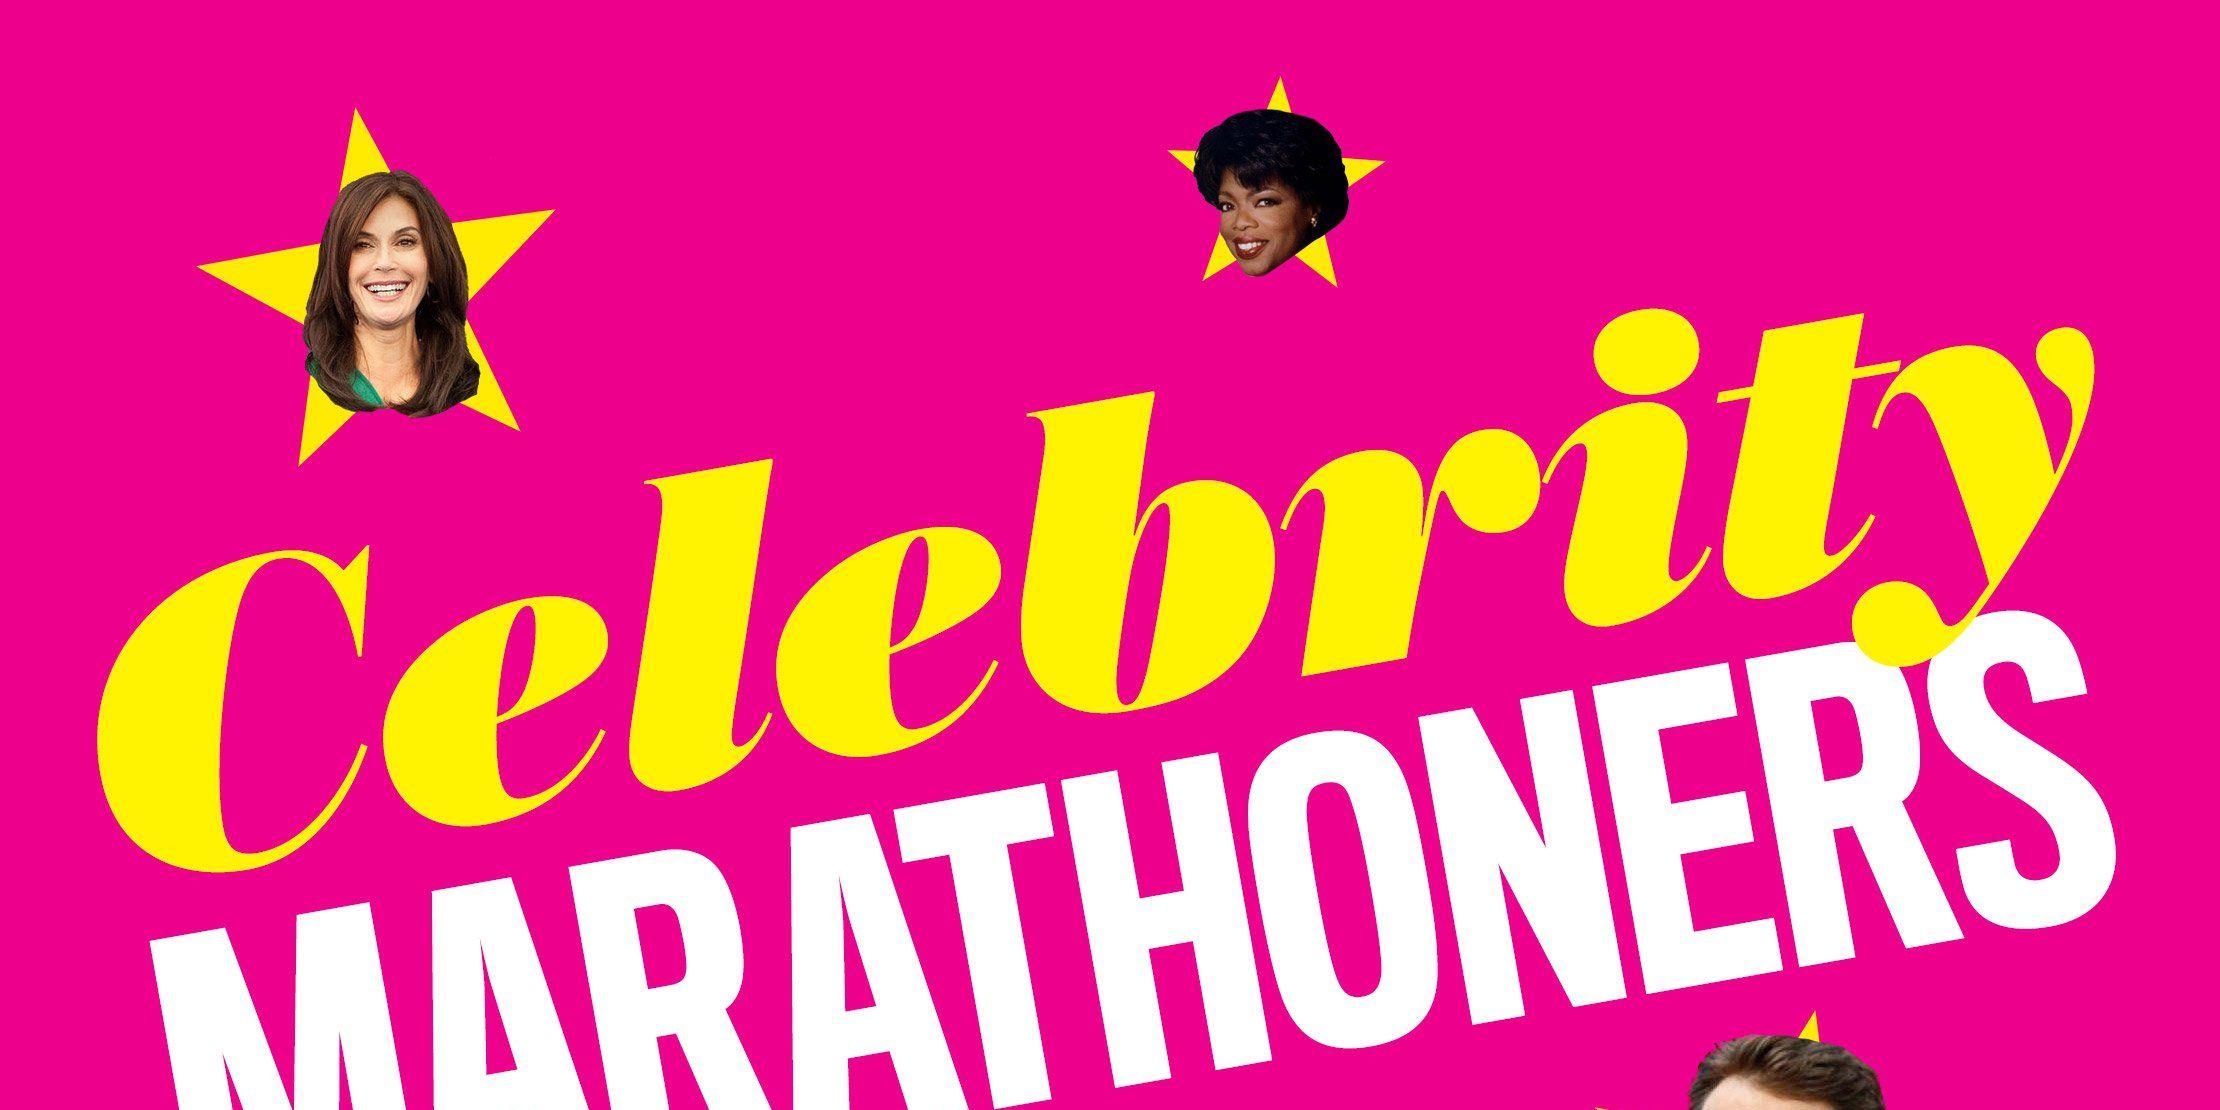 Celebrity Marathoners intro pic